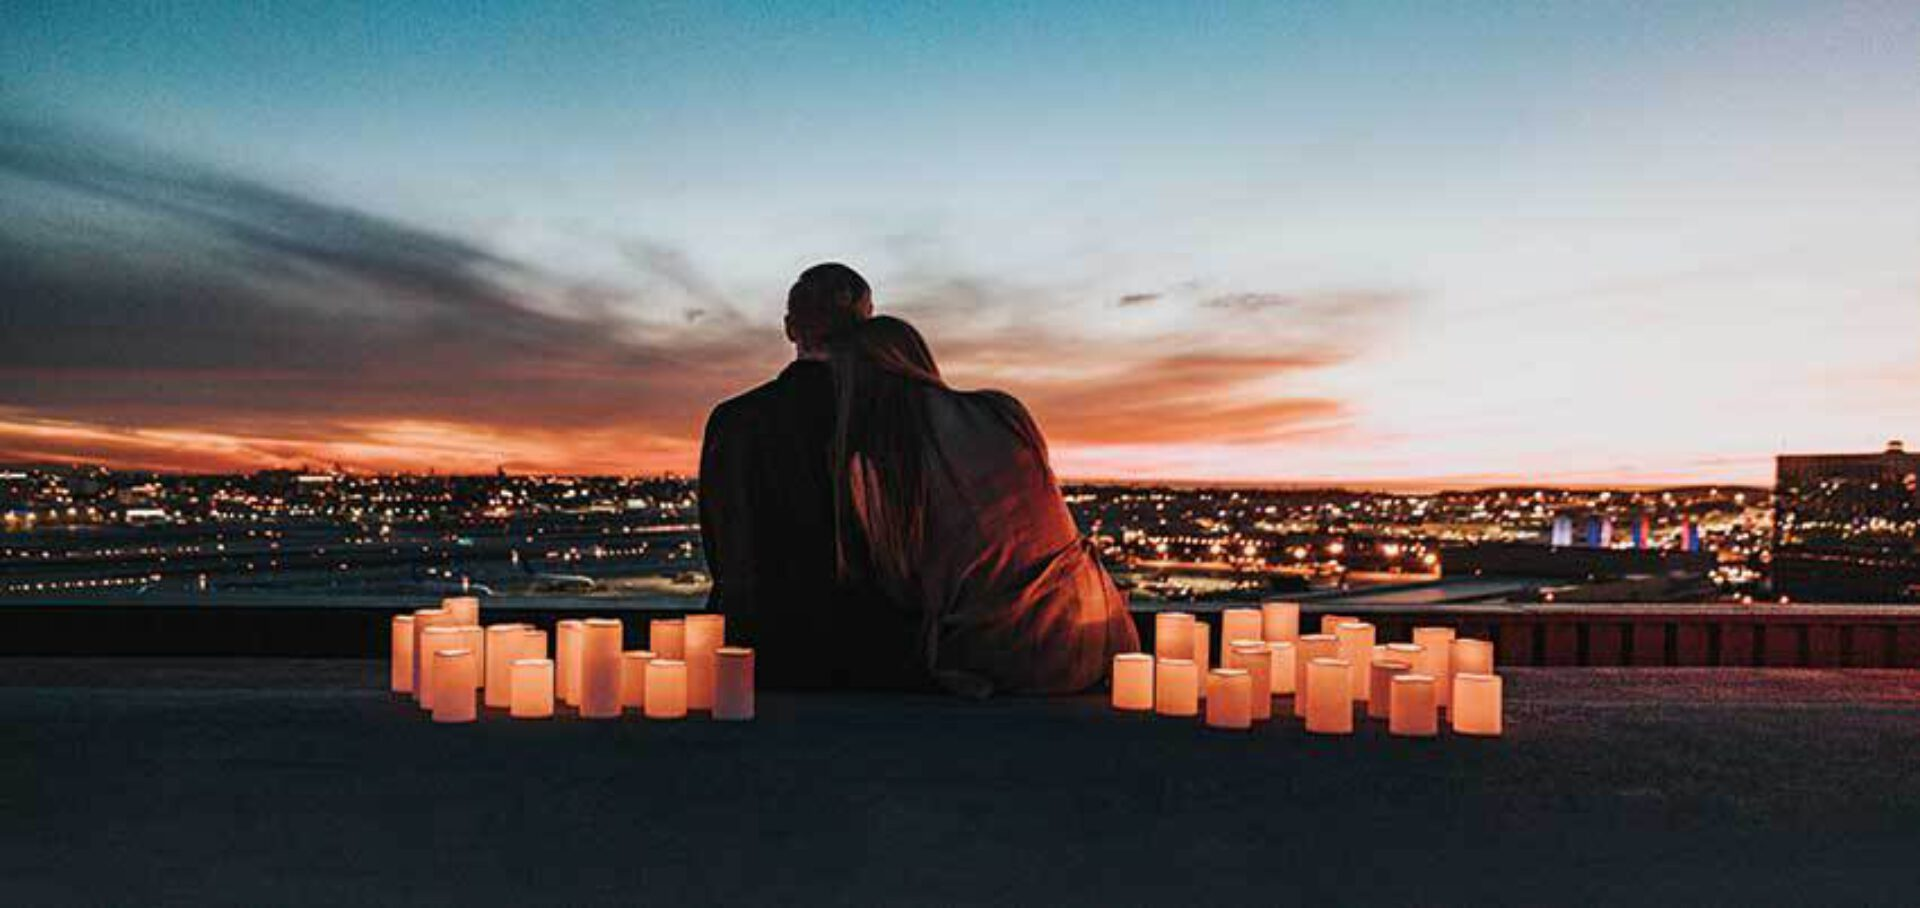 Liefde & spiritualiteit